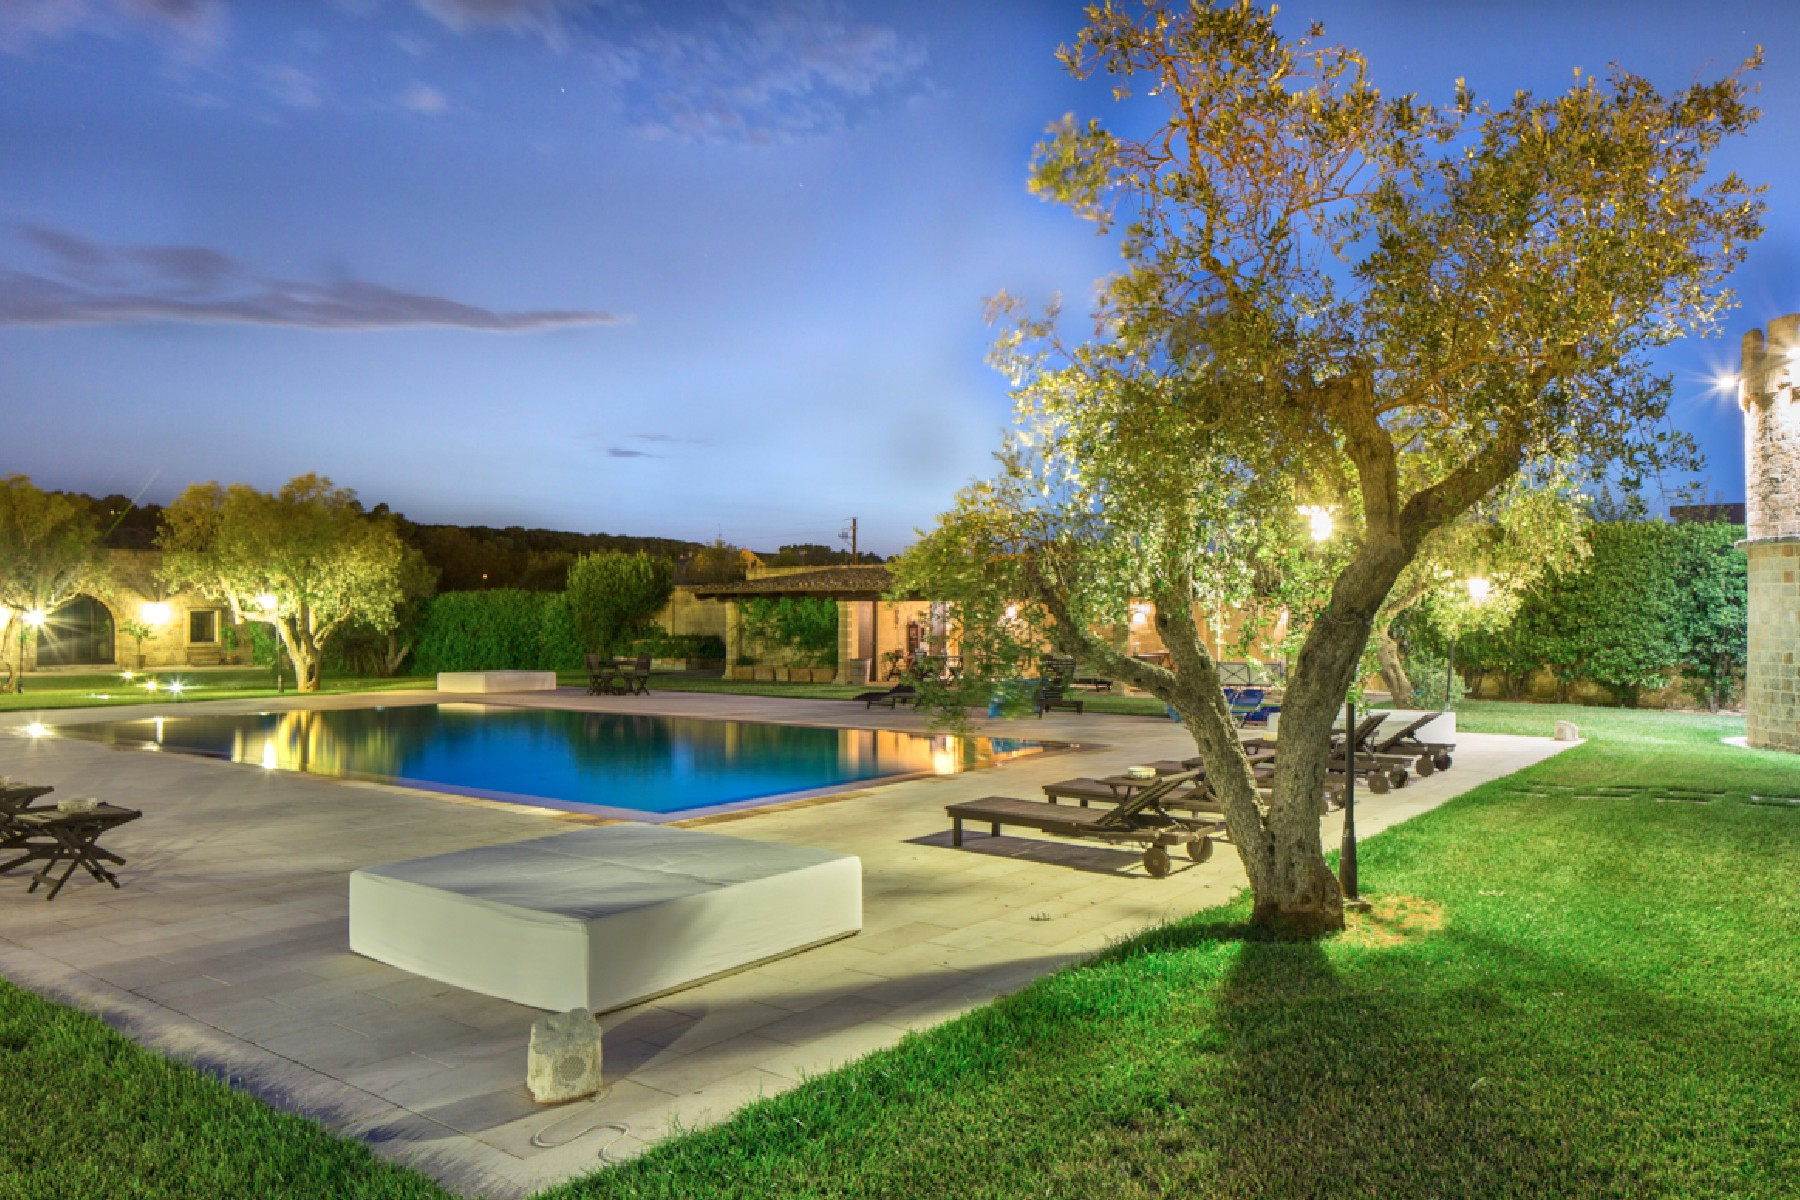 Villa in Vendita a Tricase: 5 locali, 1700 mq - Foto 12